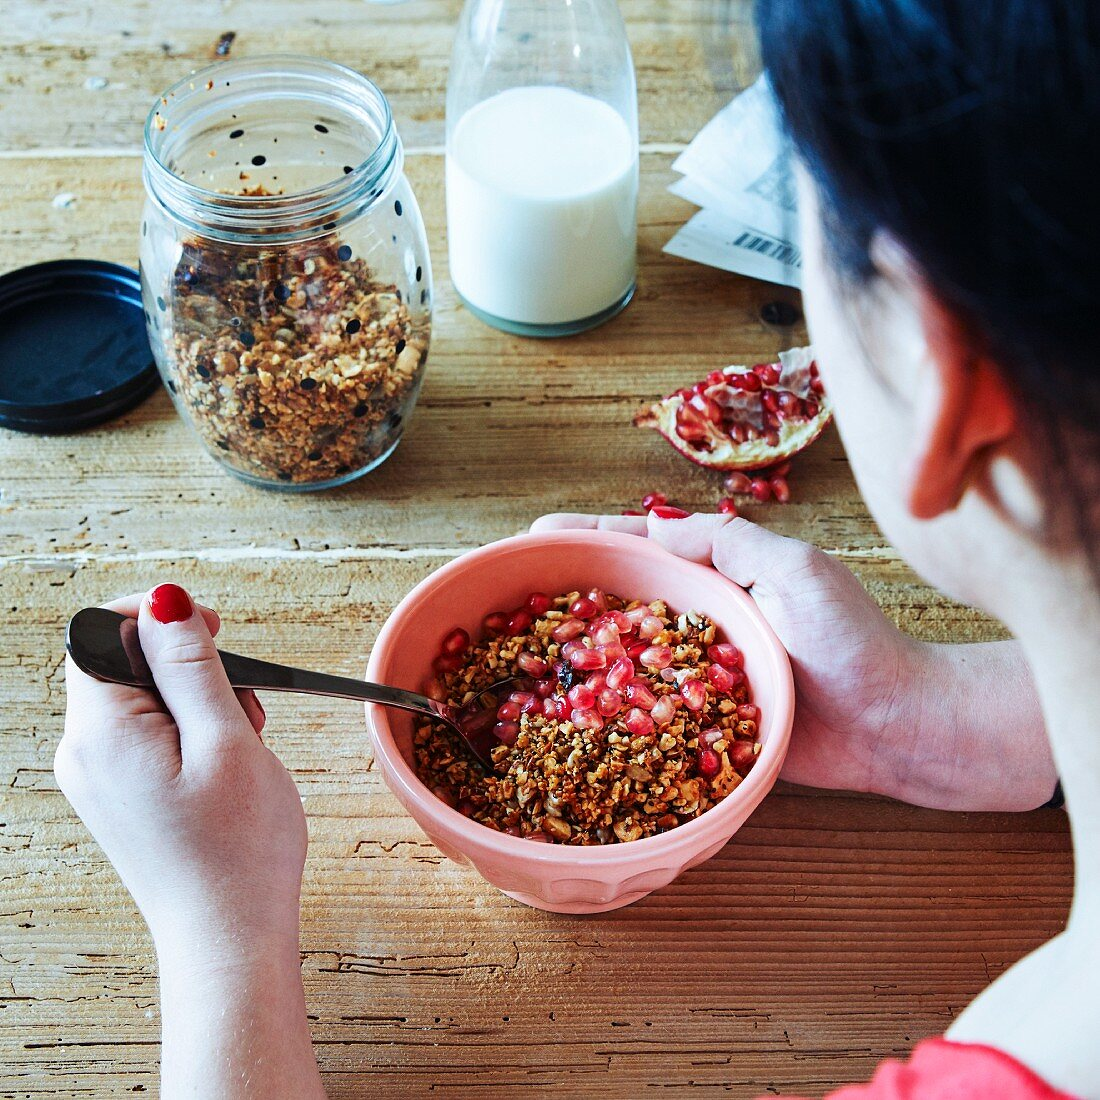 Grain-free nut muesli with pomegranate seeds